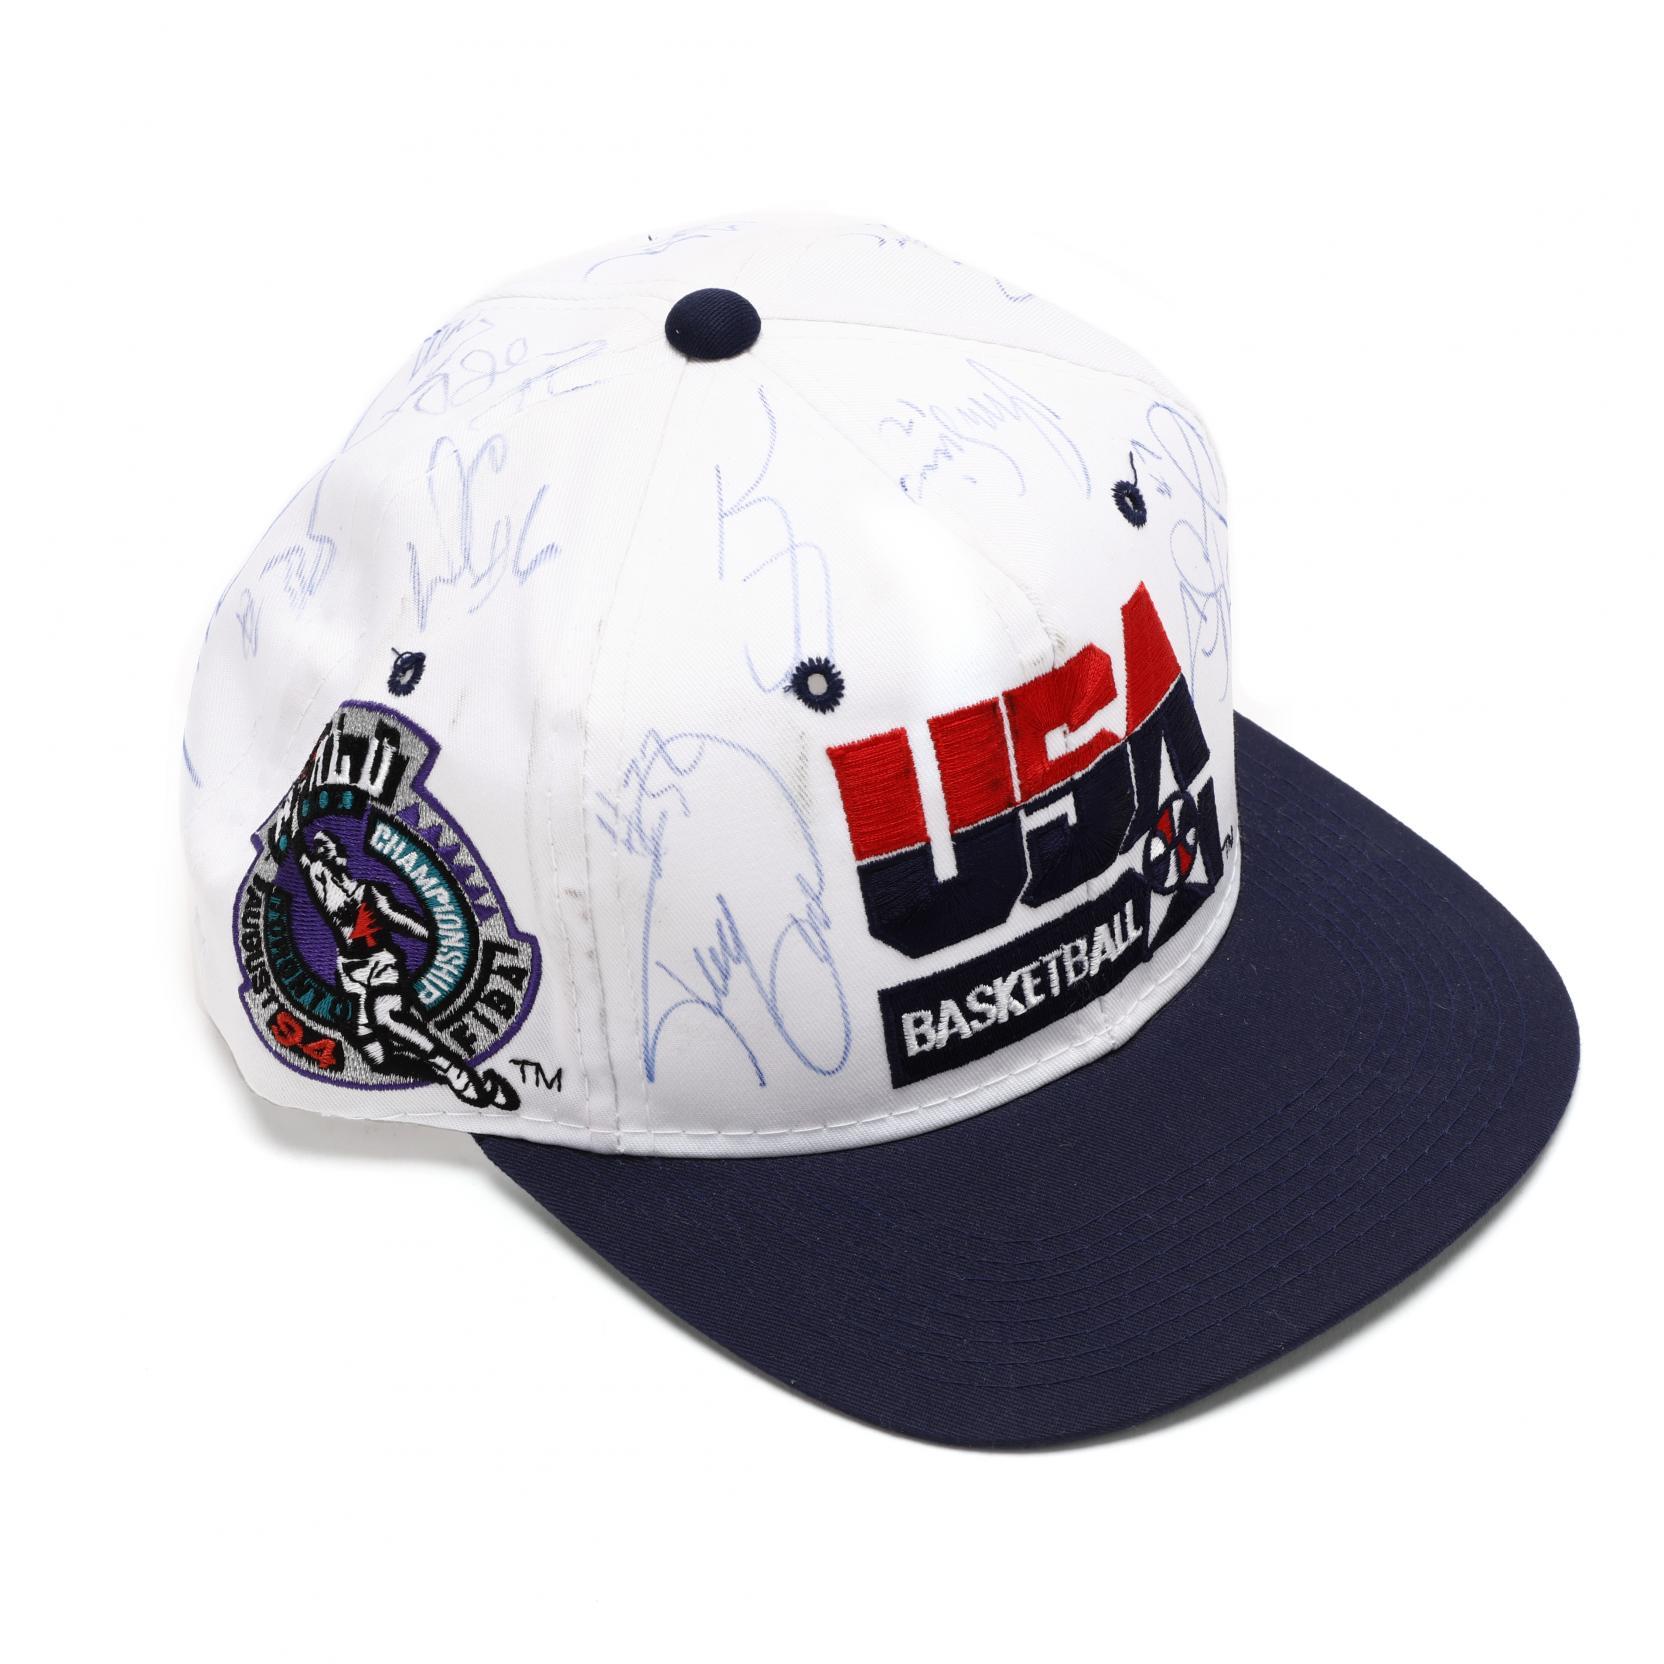 1994-fiba-world-championship-usa-basketball-signed-team-cap